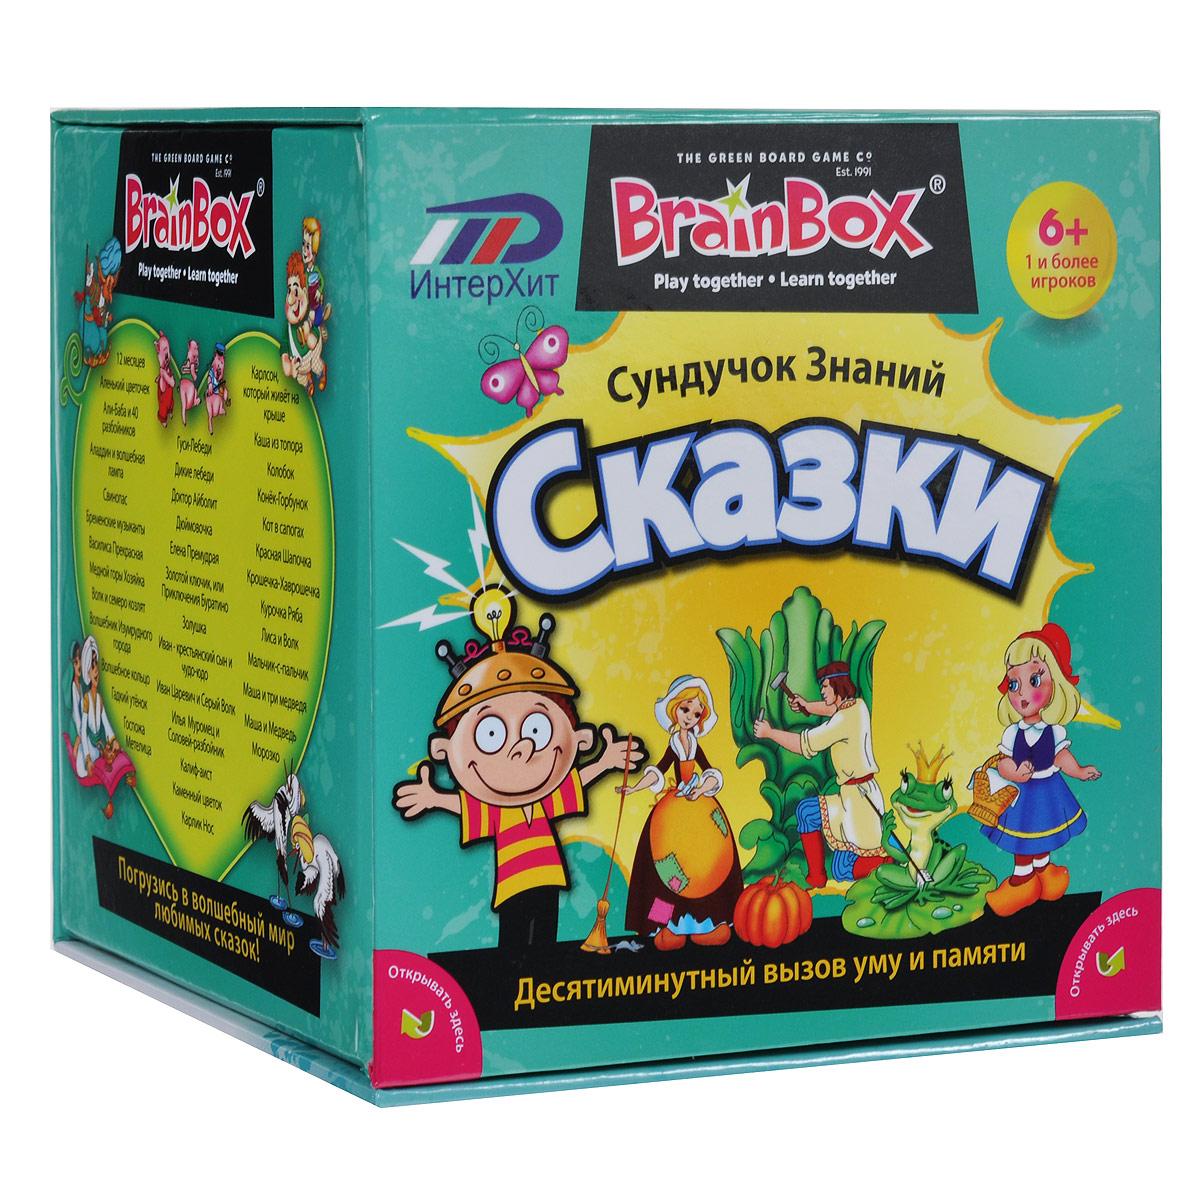 BrainBox Обучающая игра Сказки, Green Board Game Co Ltd